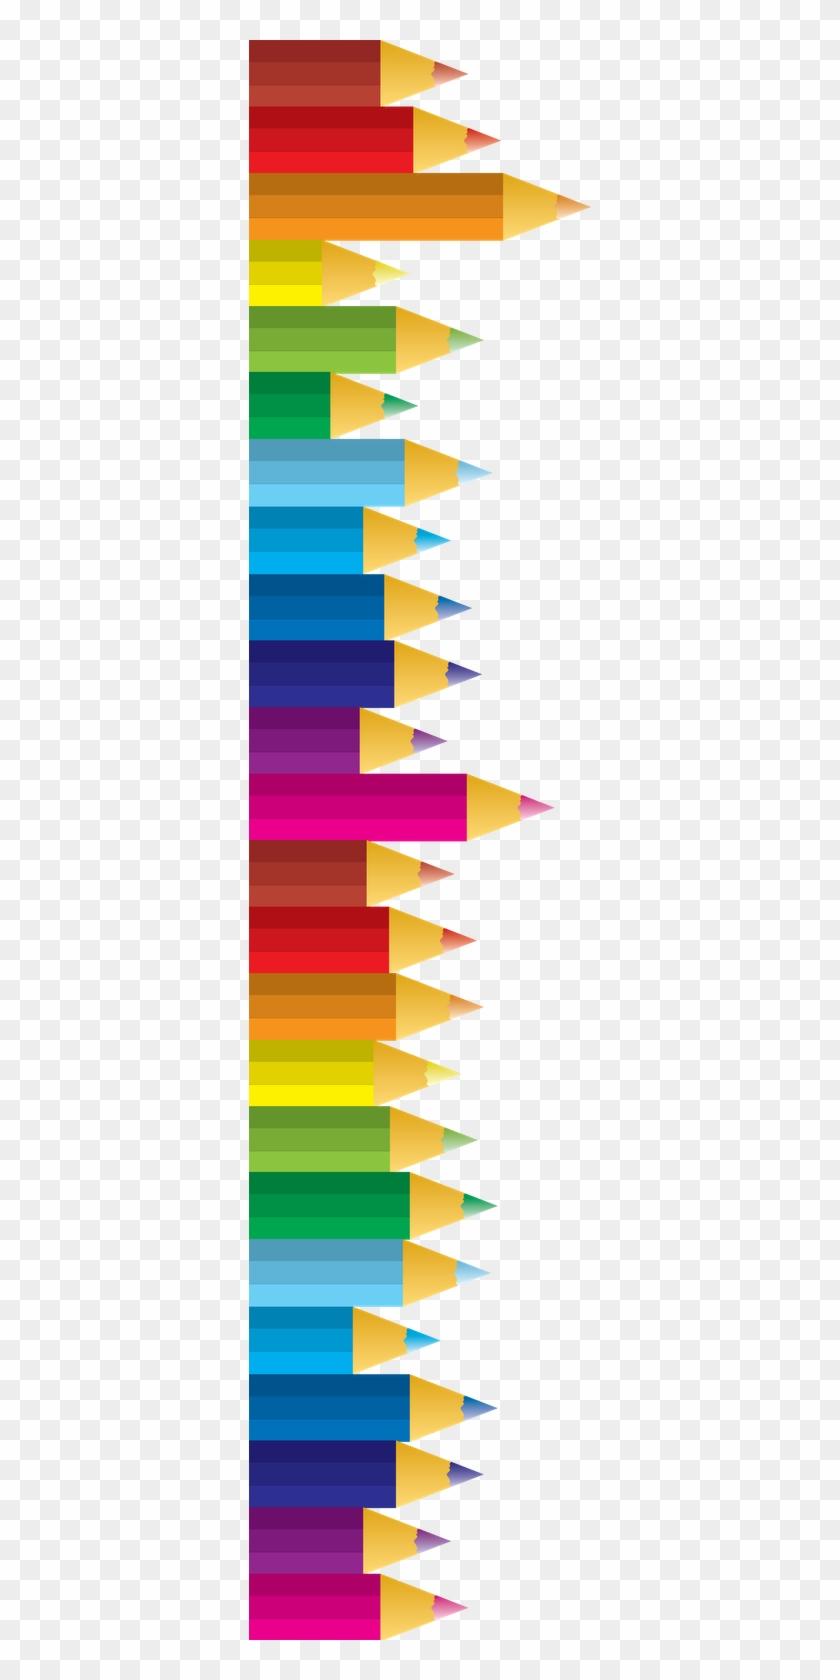 Free Pencil Clipart For Teachers - Color Pencil Border Clipart #230929